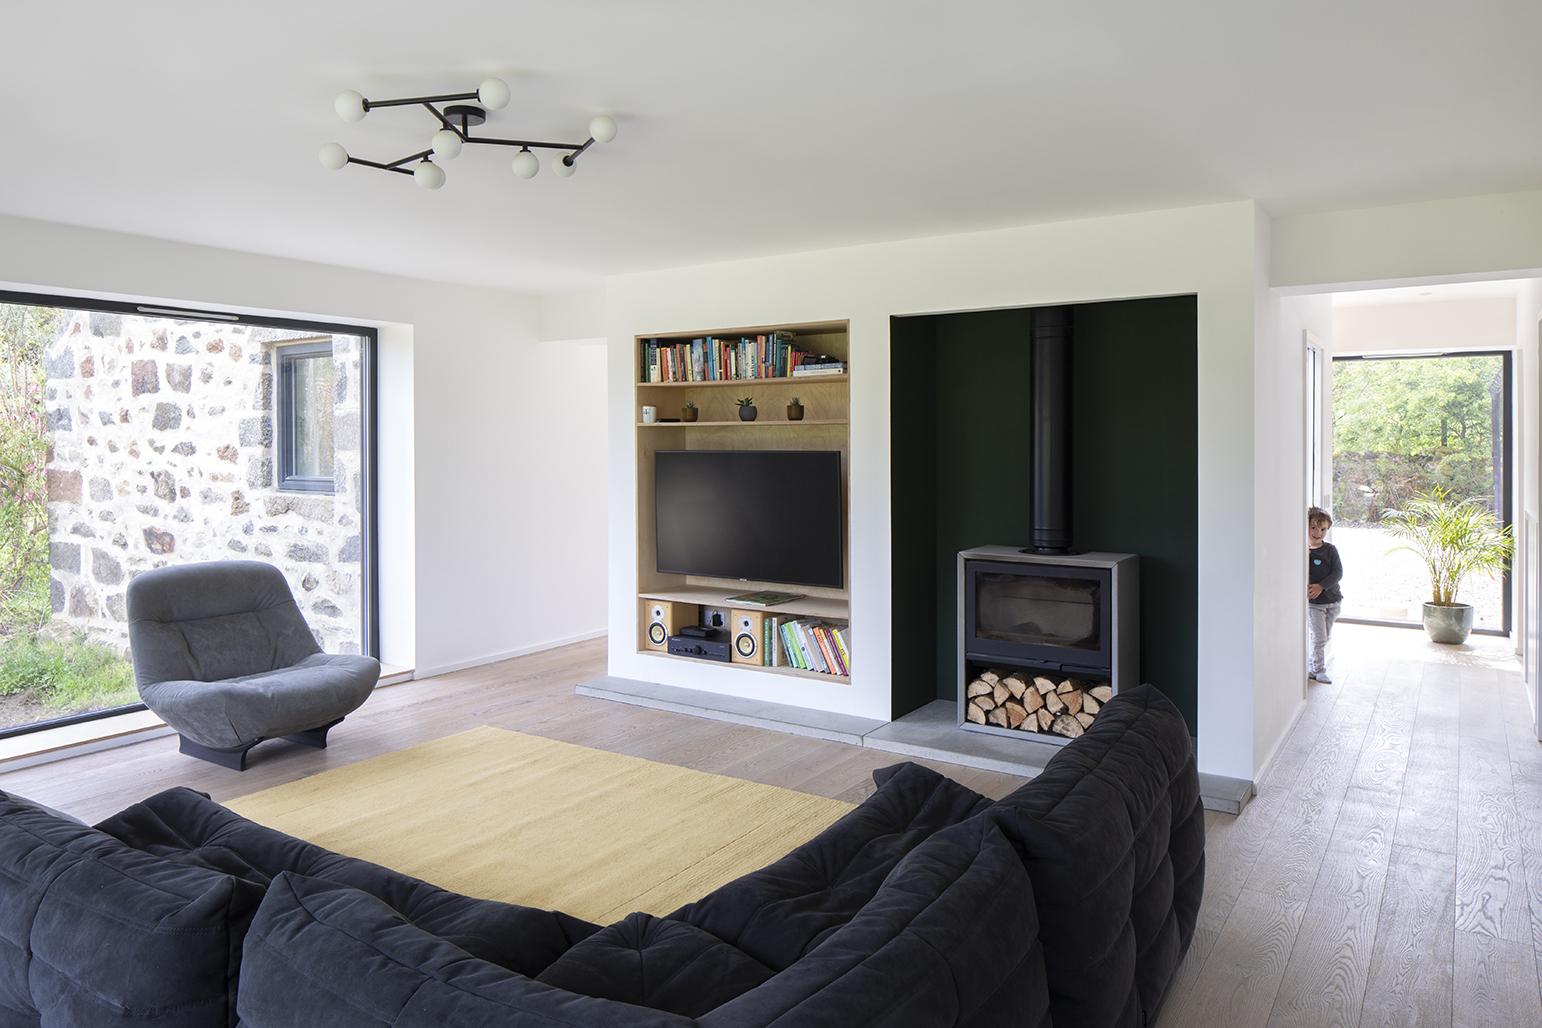 Cornival-Interior-Lounge-Cottage-Refurbishment-Extension-Aberdeenshire-12.jpg